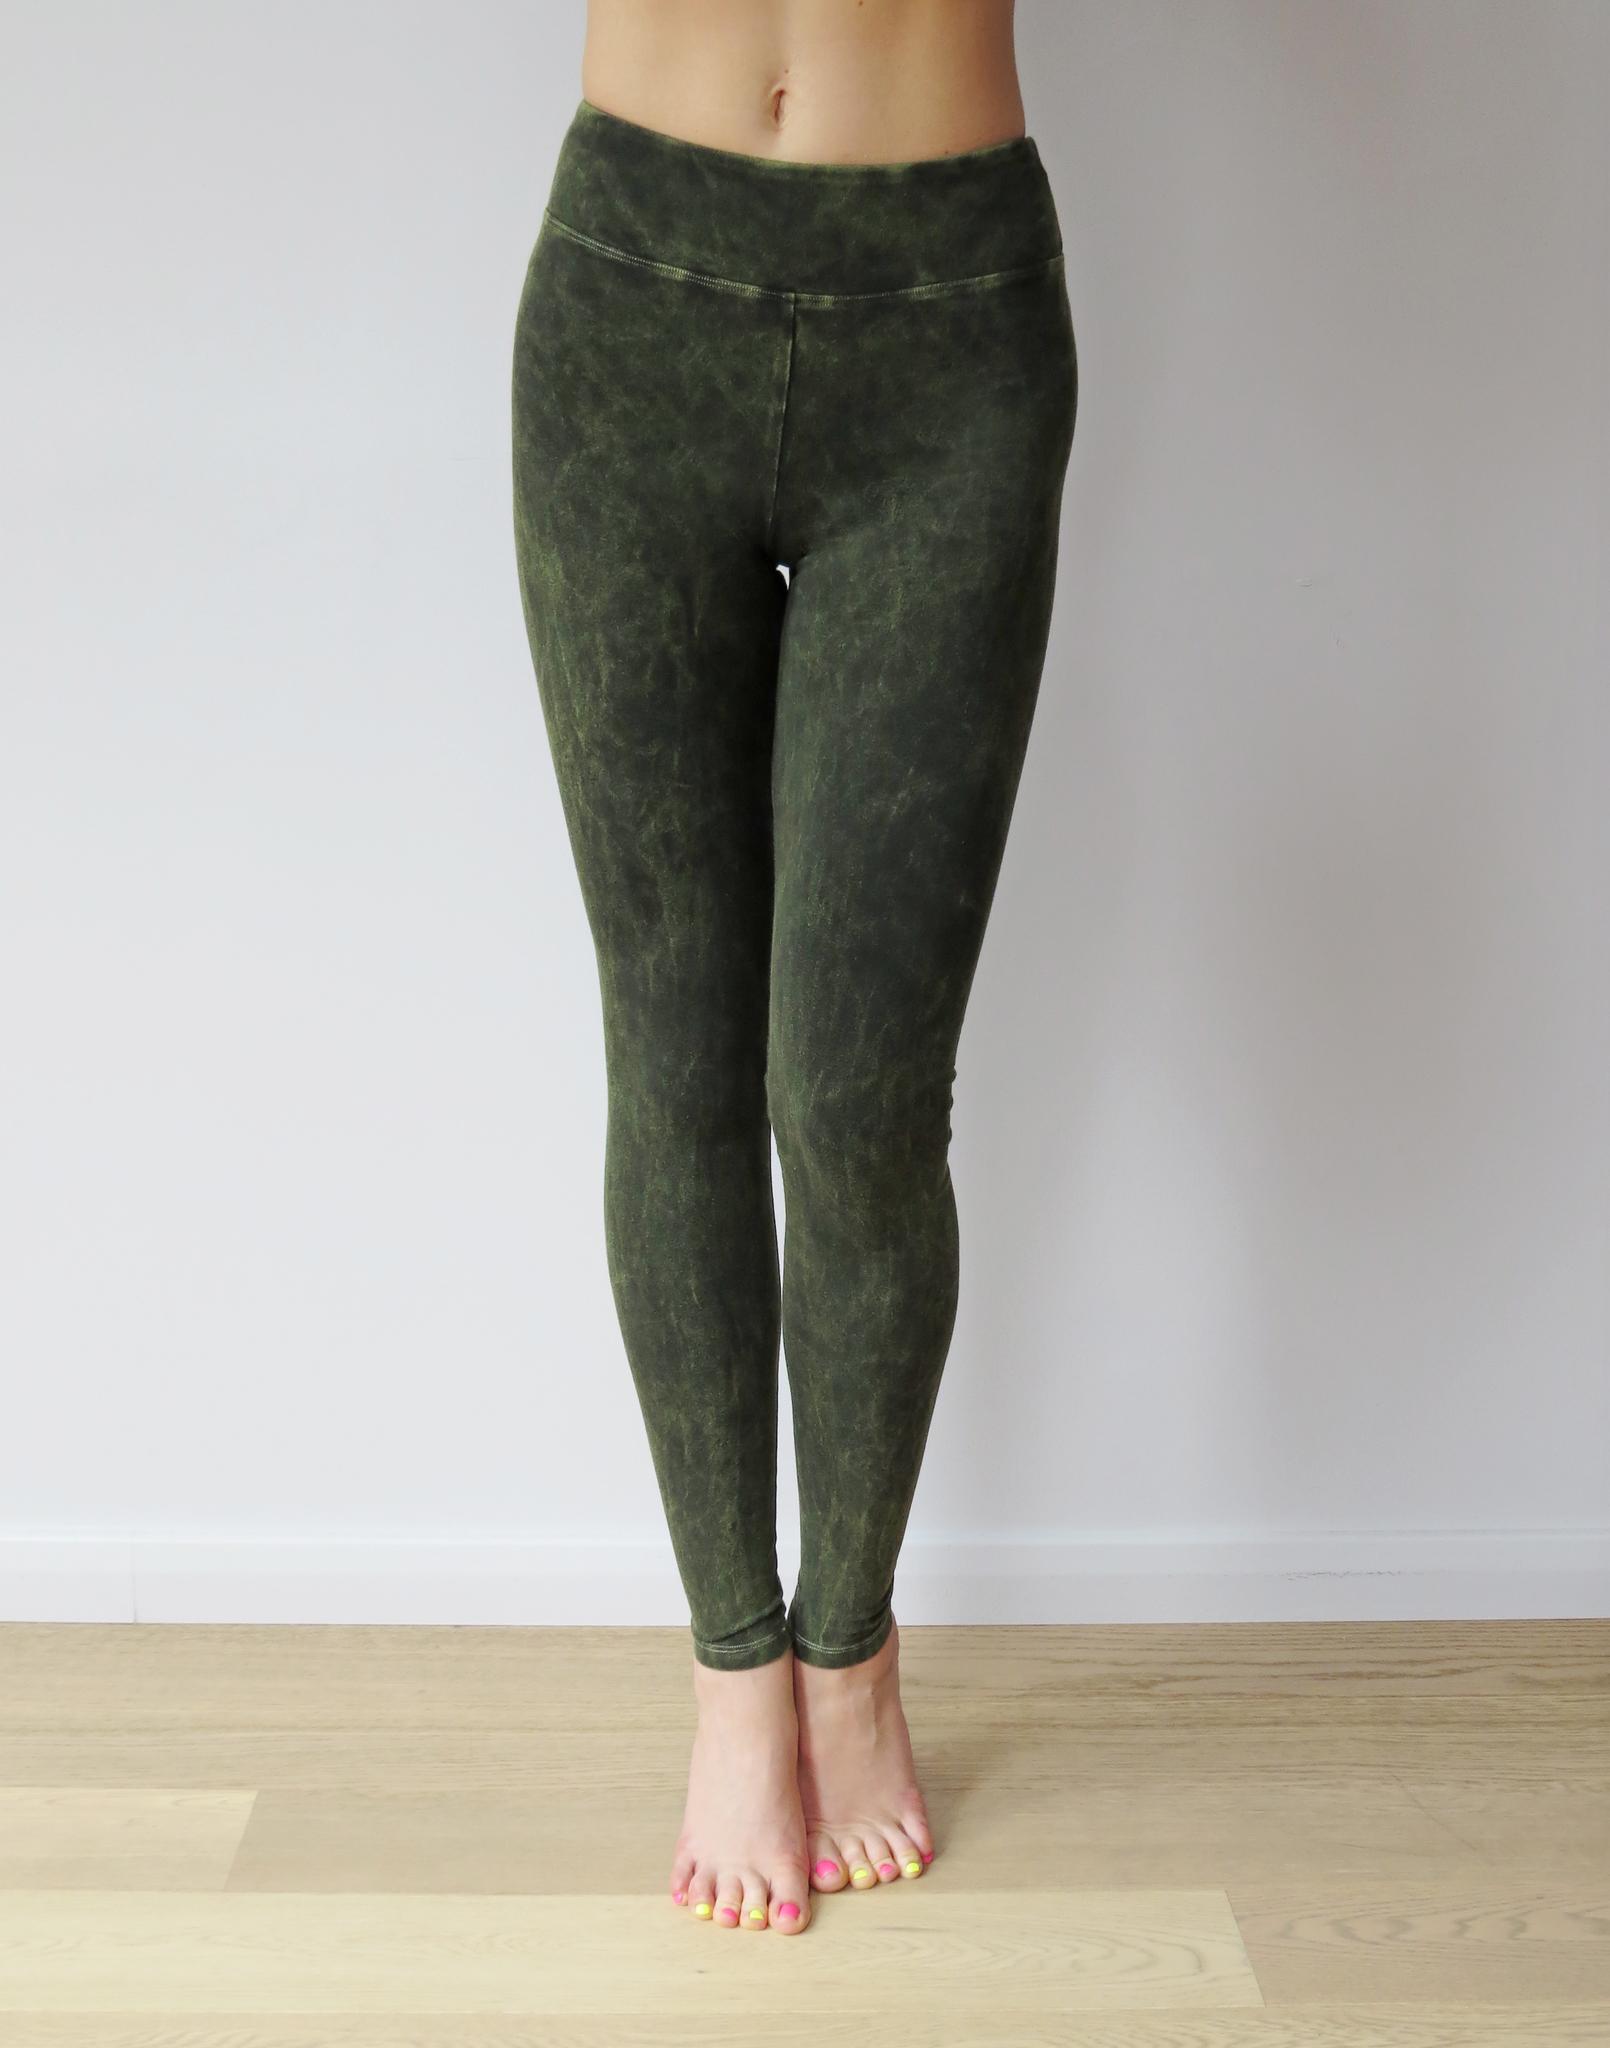 Леггинсы Forest YogaDress (0,3 кг, L(48), зеленый)